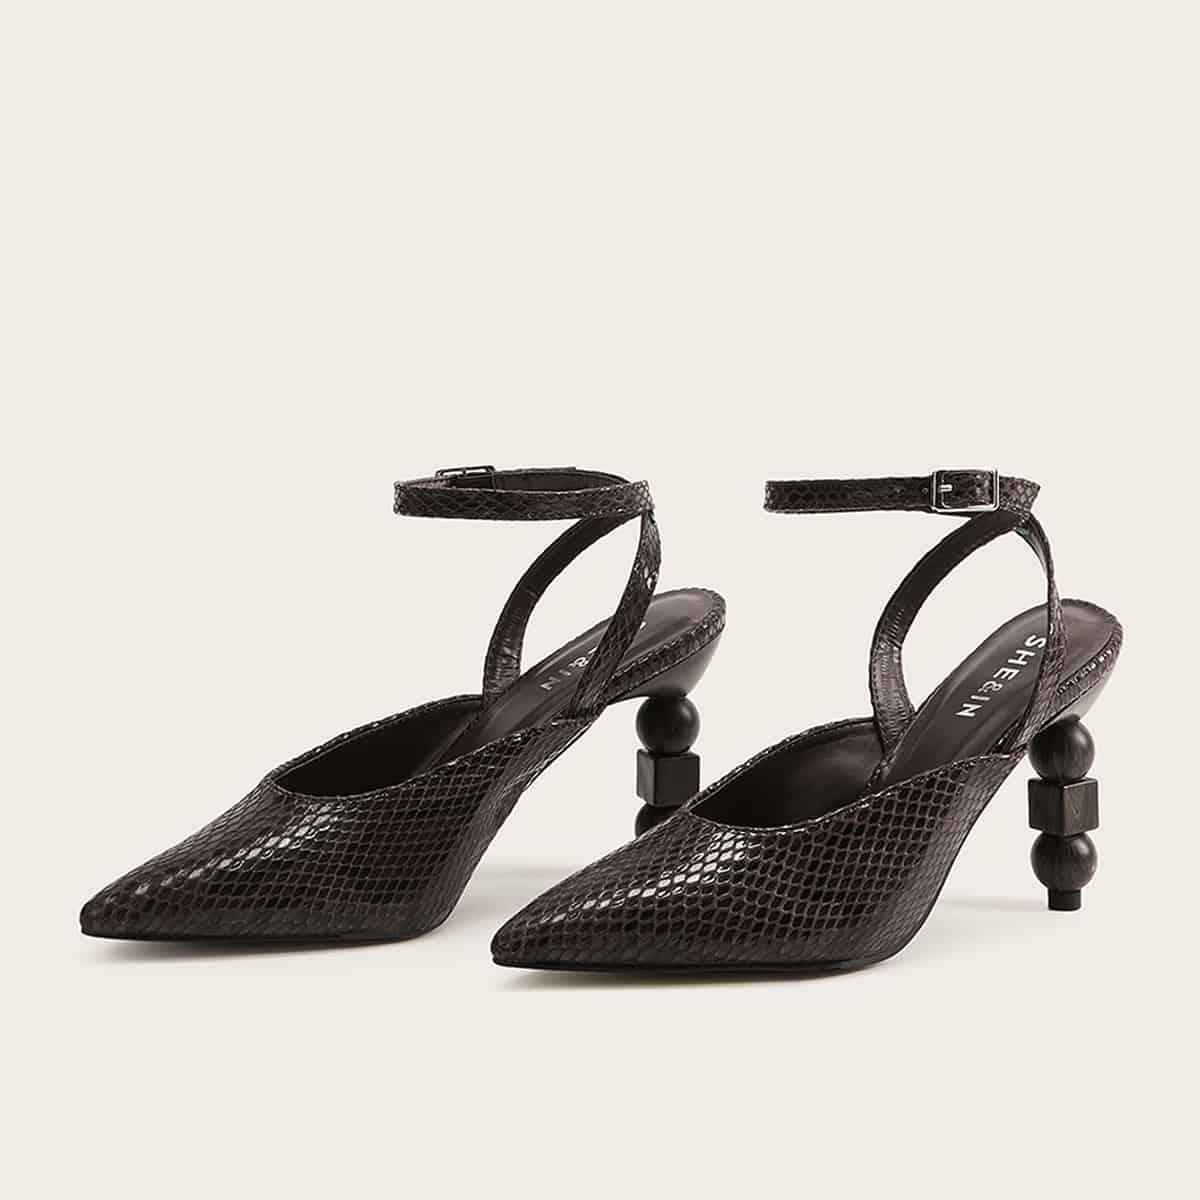 Snakeskin Point Toe Heels